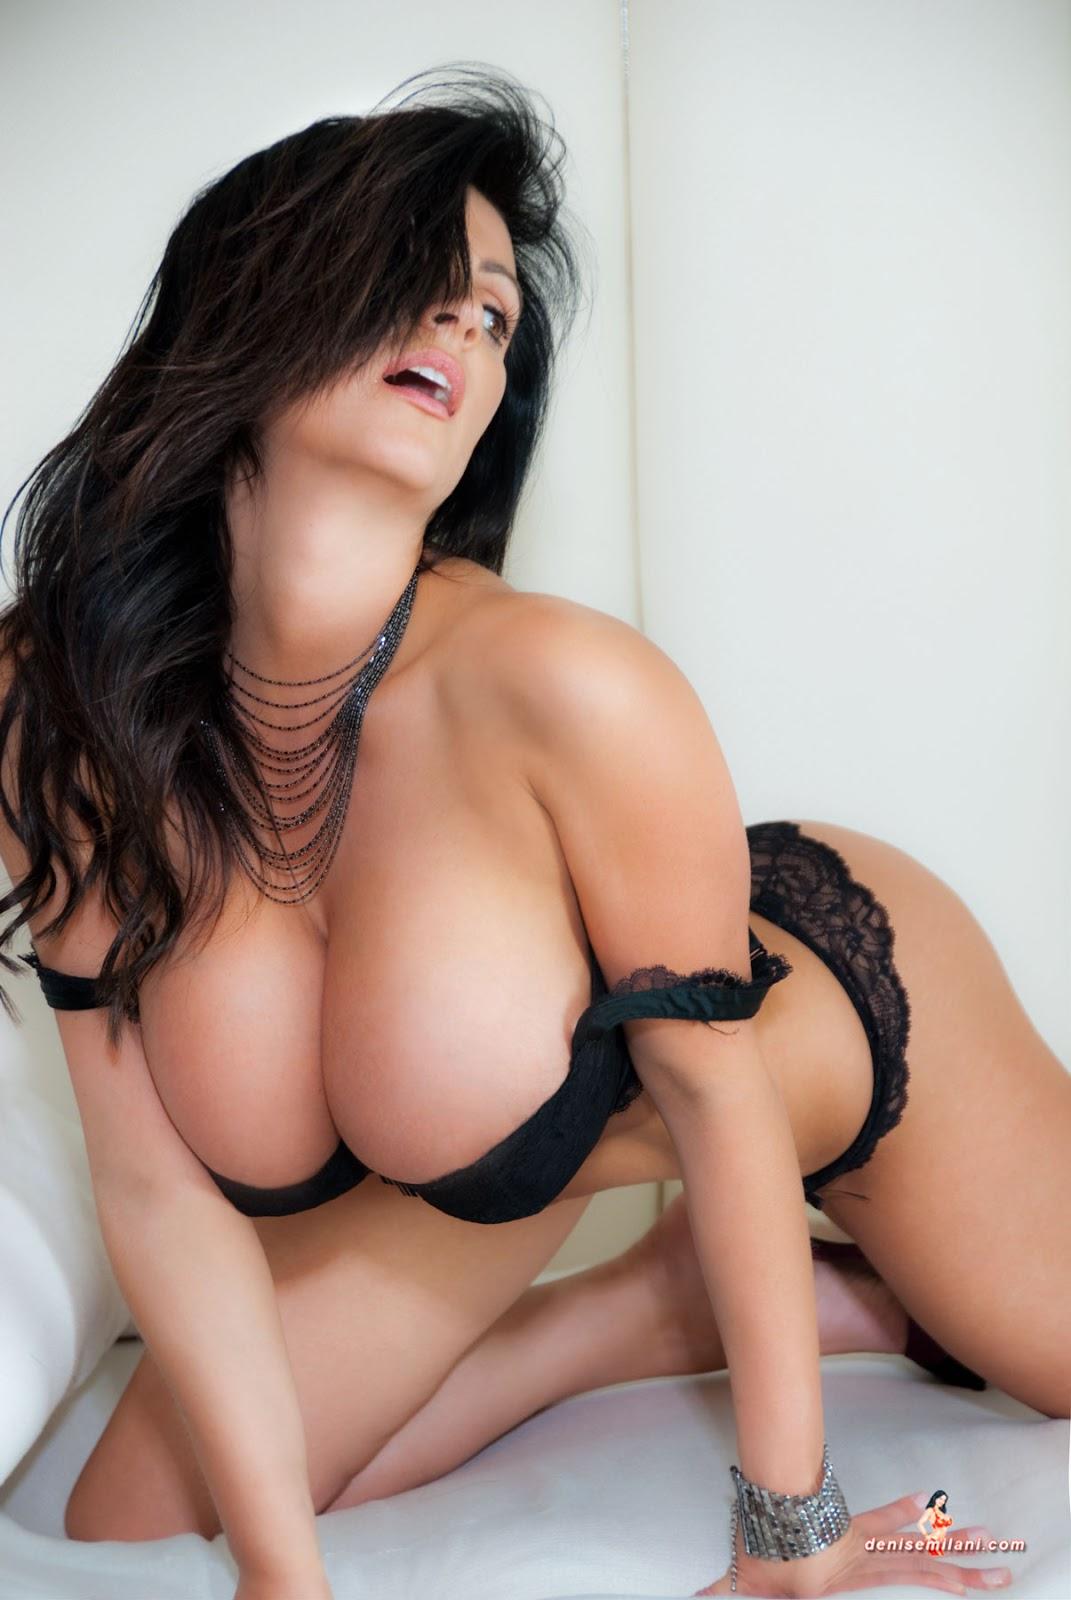 Naked Women Big Ass Gif